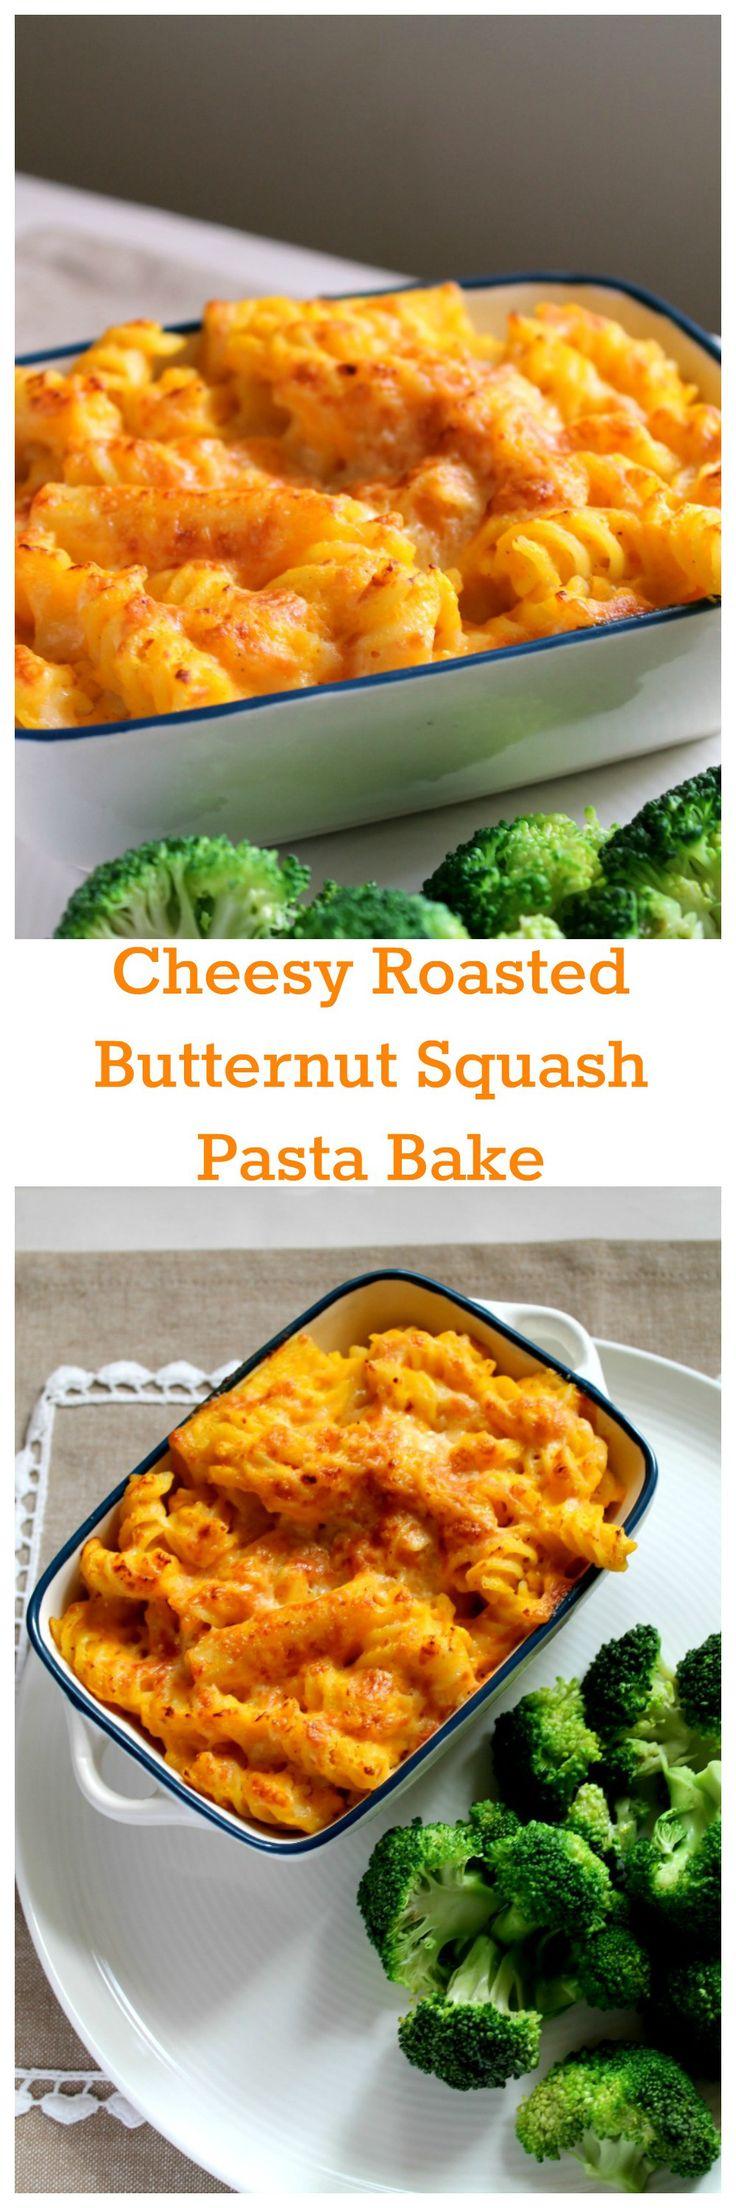 ... food cheesy roasted butternut squash pasta pasta bake macaroni cheese